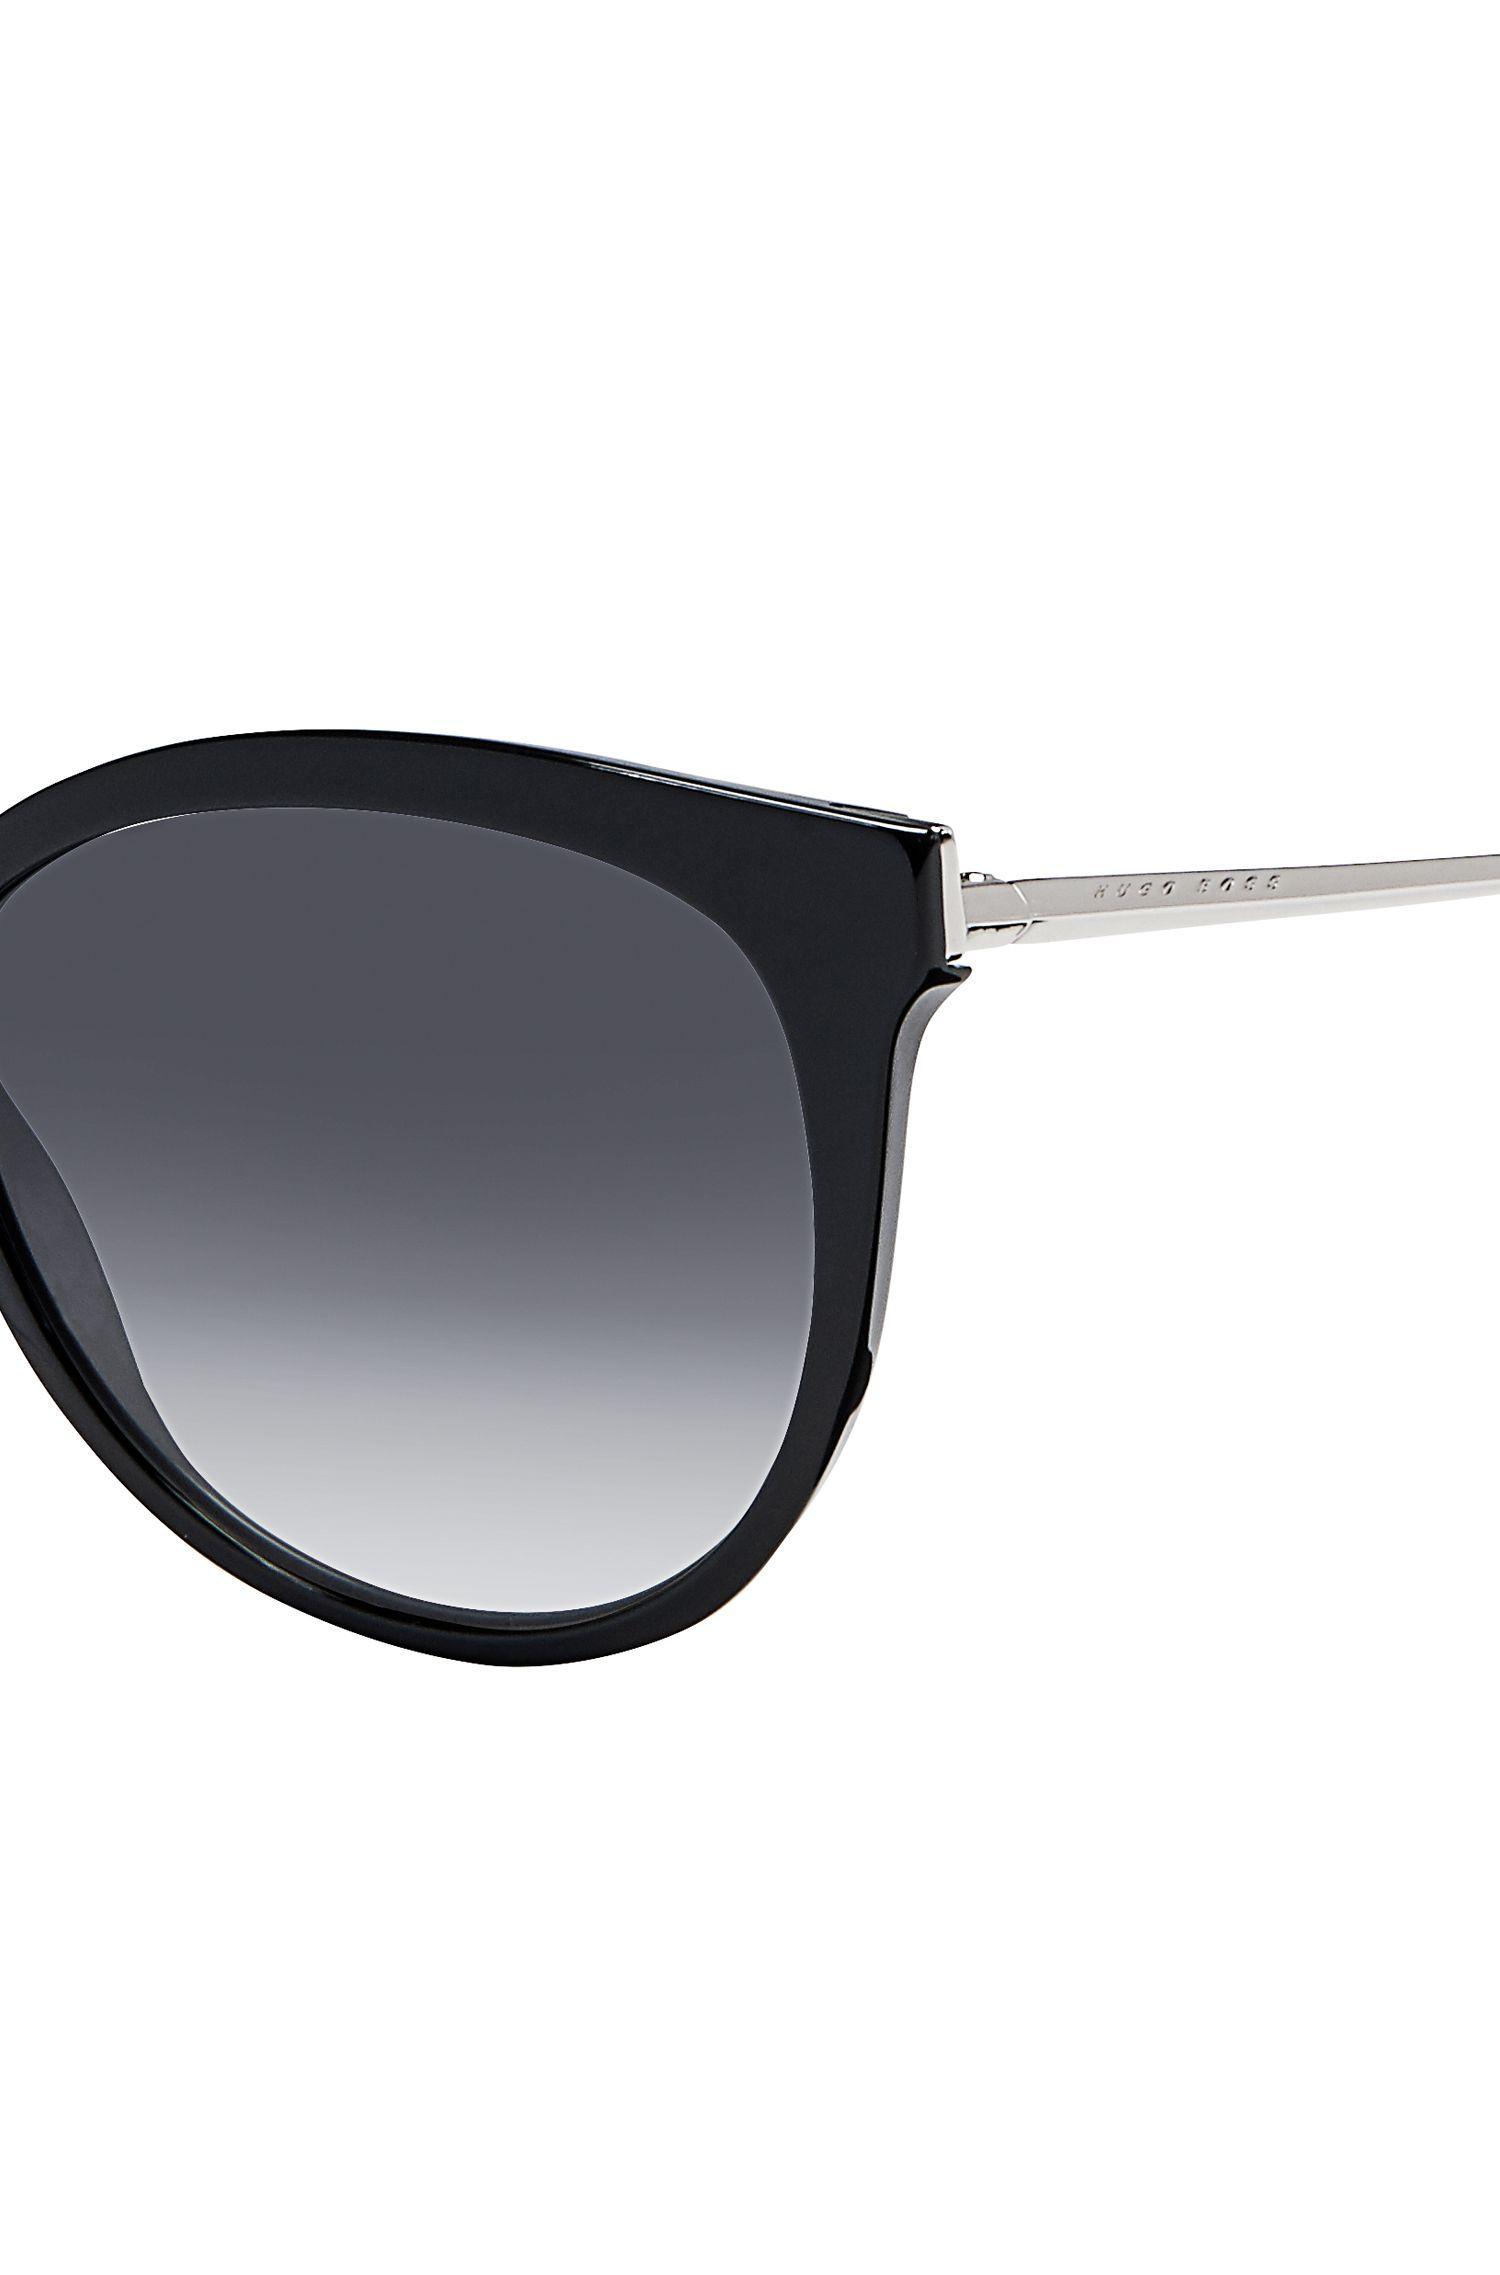 Black Cat-eye Sunglasses | BOSS 0892S